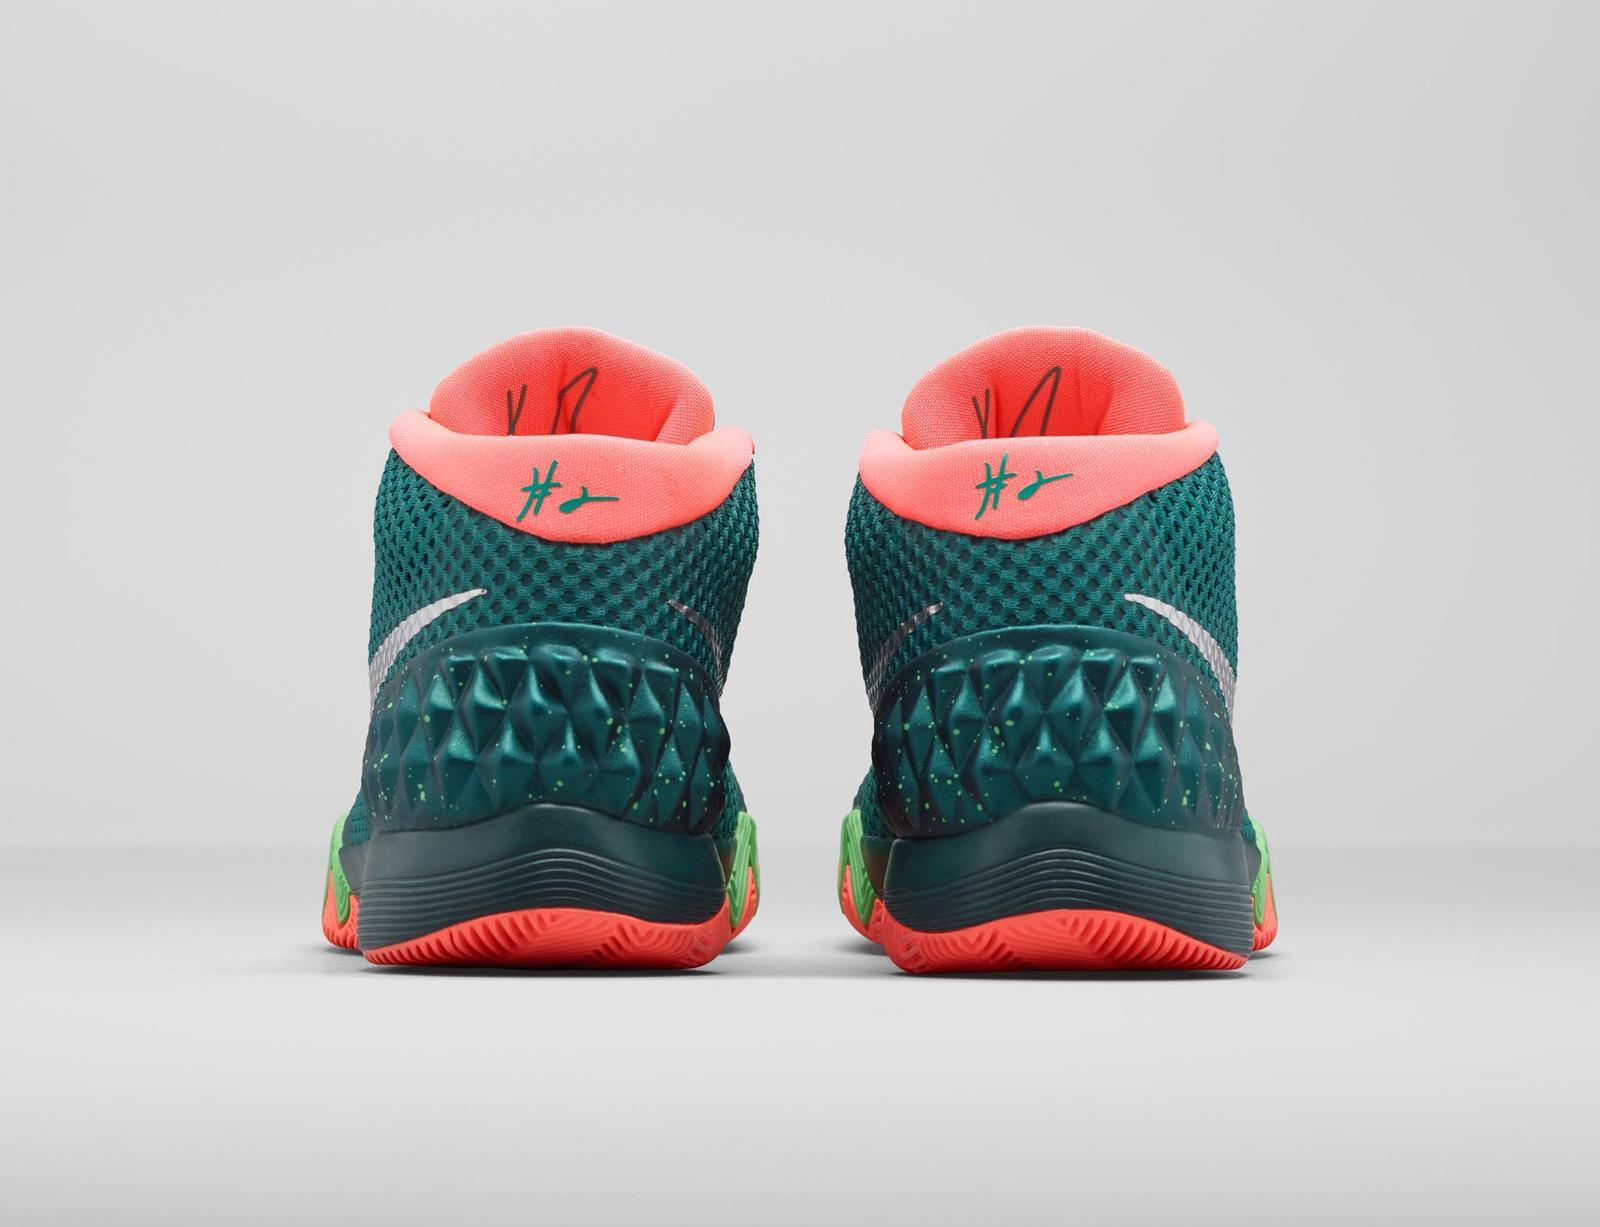 kyrie 1 flytrap basketball shoe captures deceptive